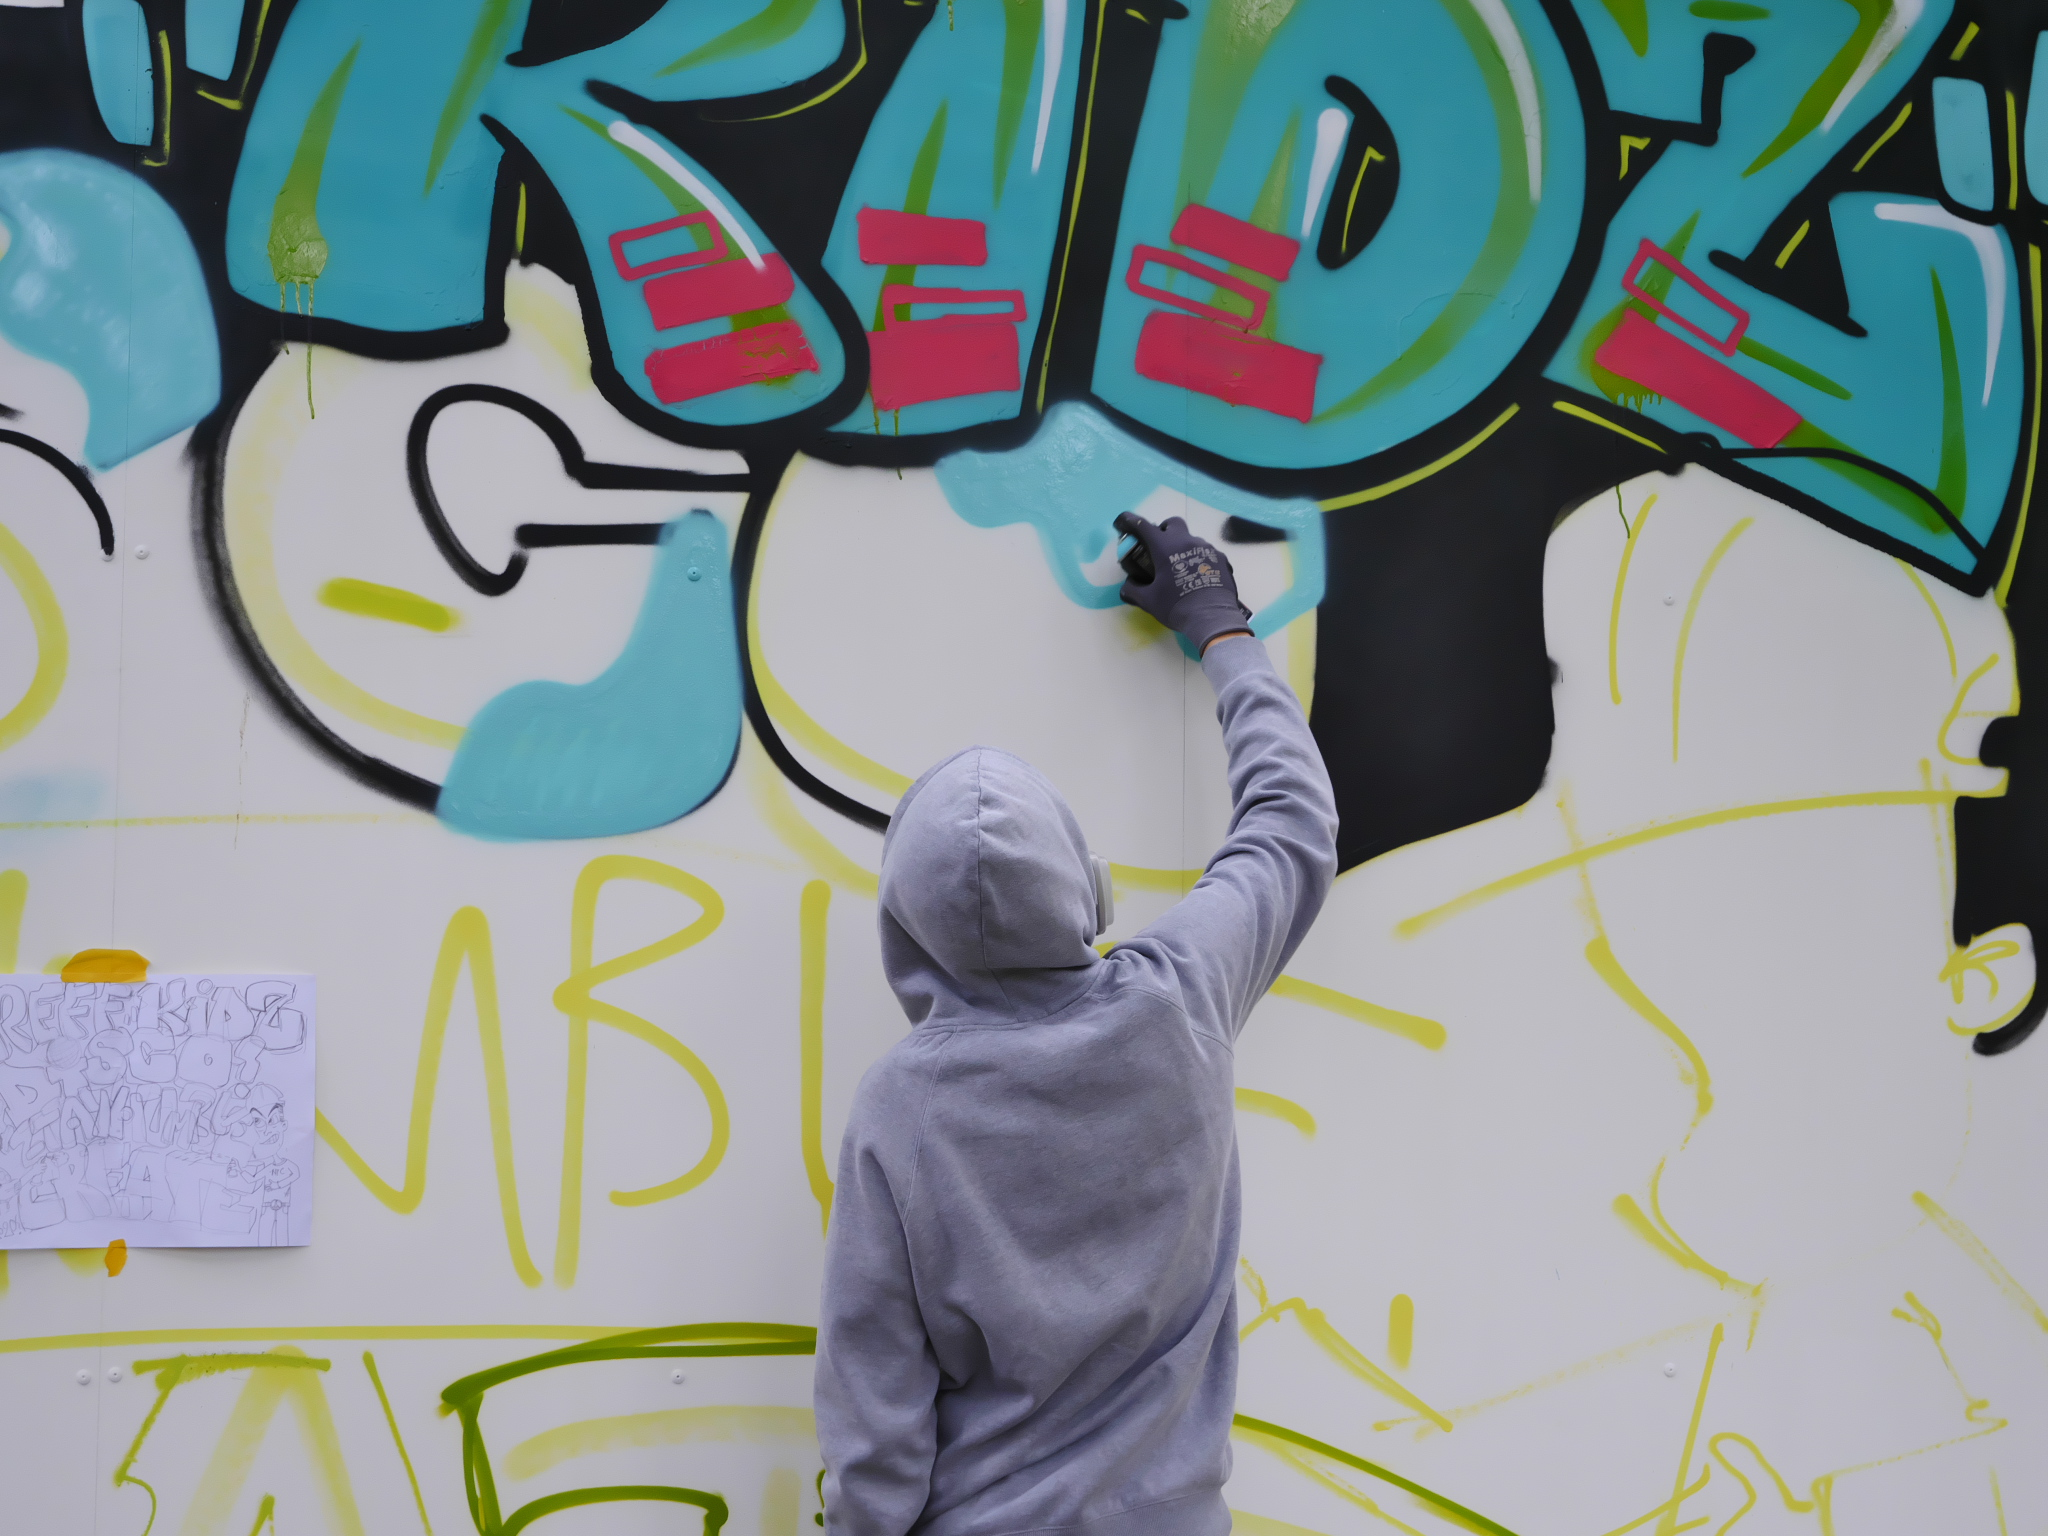 jugendkulturjahr-2020-ratingen-jkj2020-Graffitiworksjop-Bild10